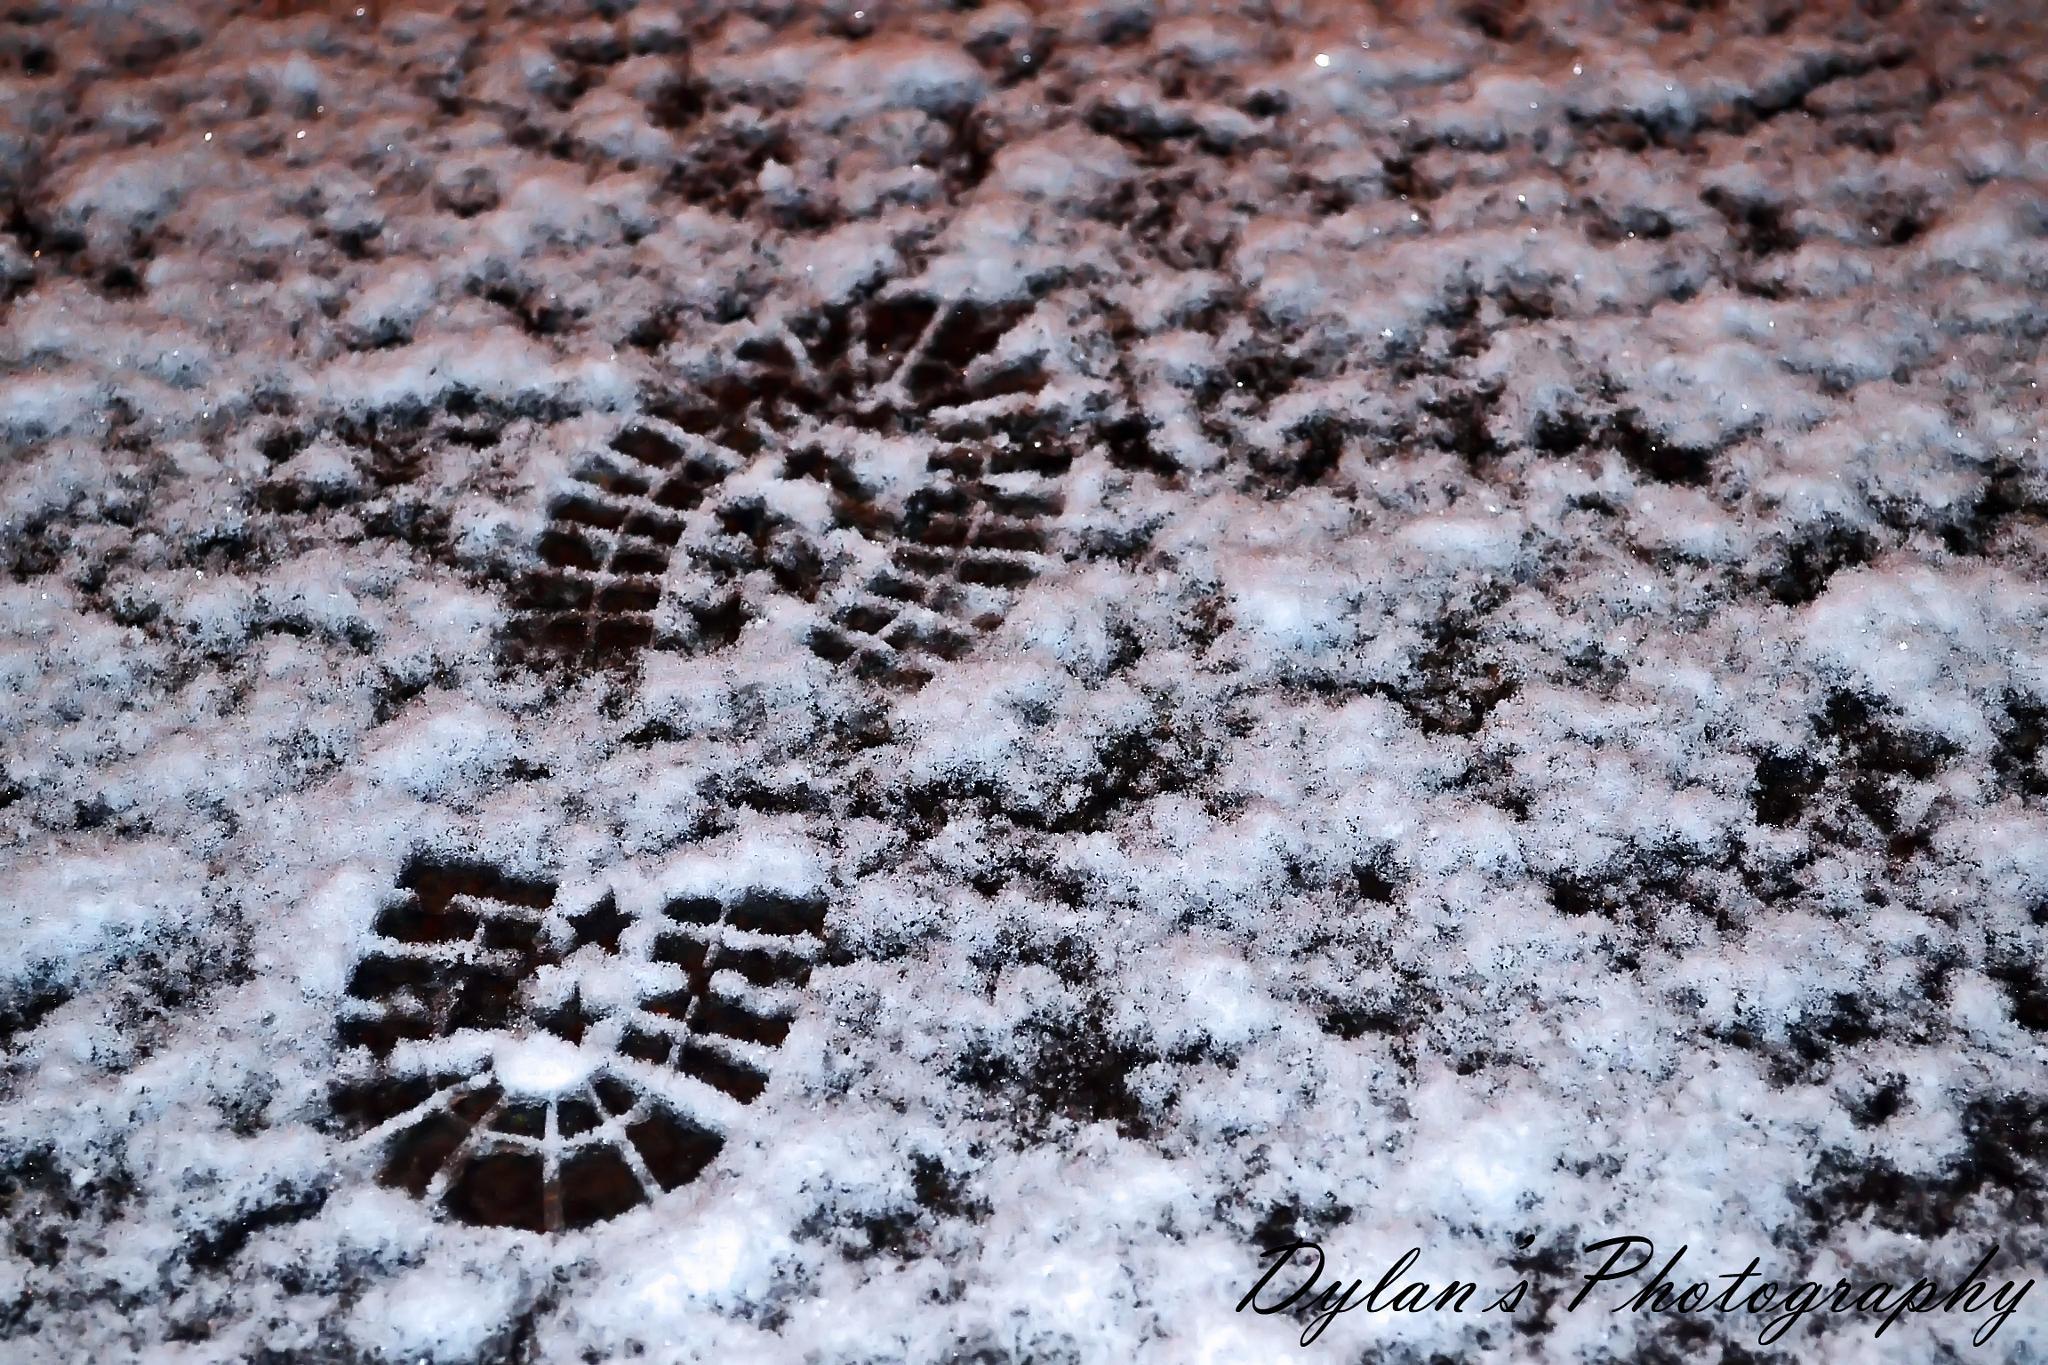 Let it snow Let it snow Let it snow ....  by Dylan Marcotte